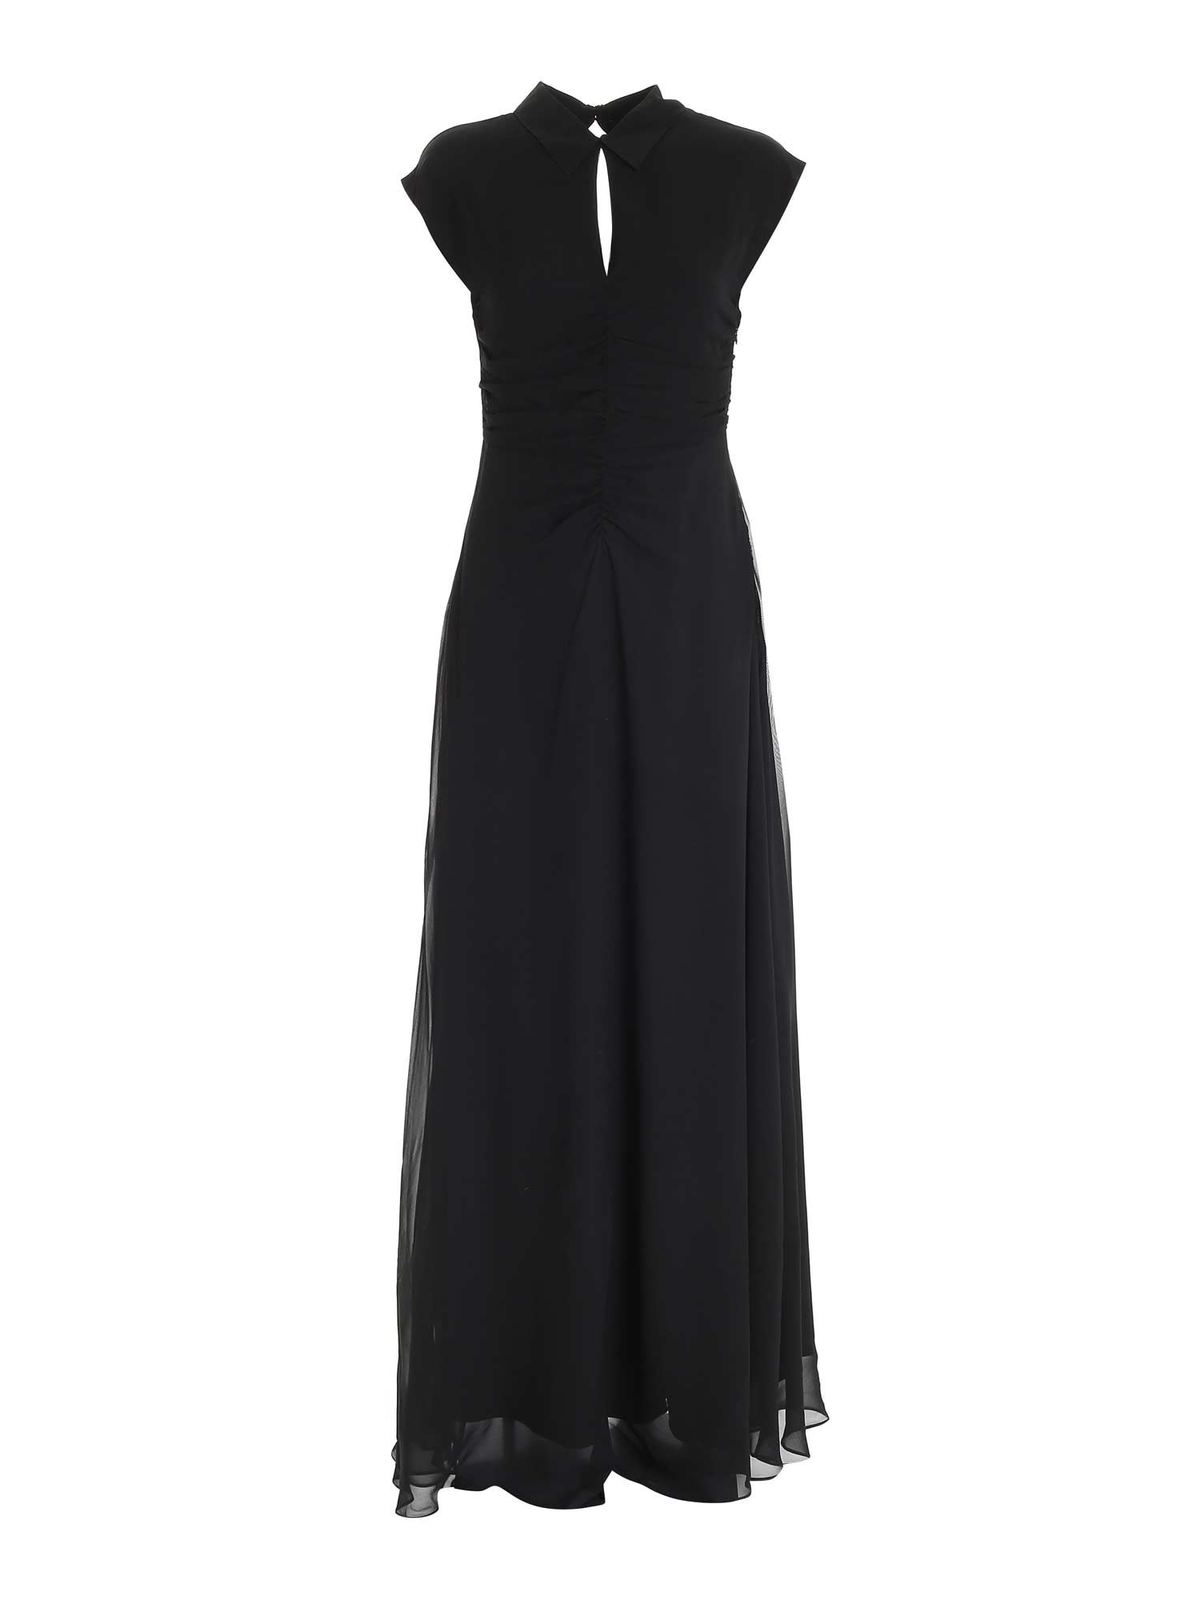 Karl Lagerfeld Cut Out Detail Long Dress In Black